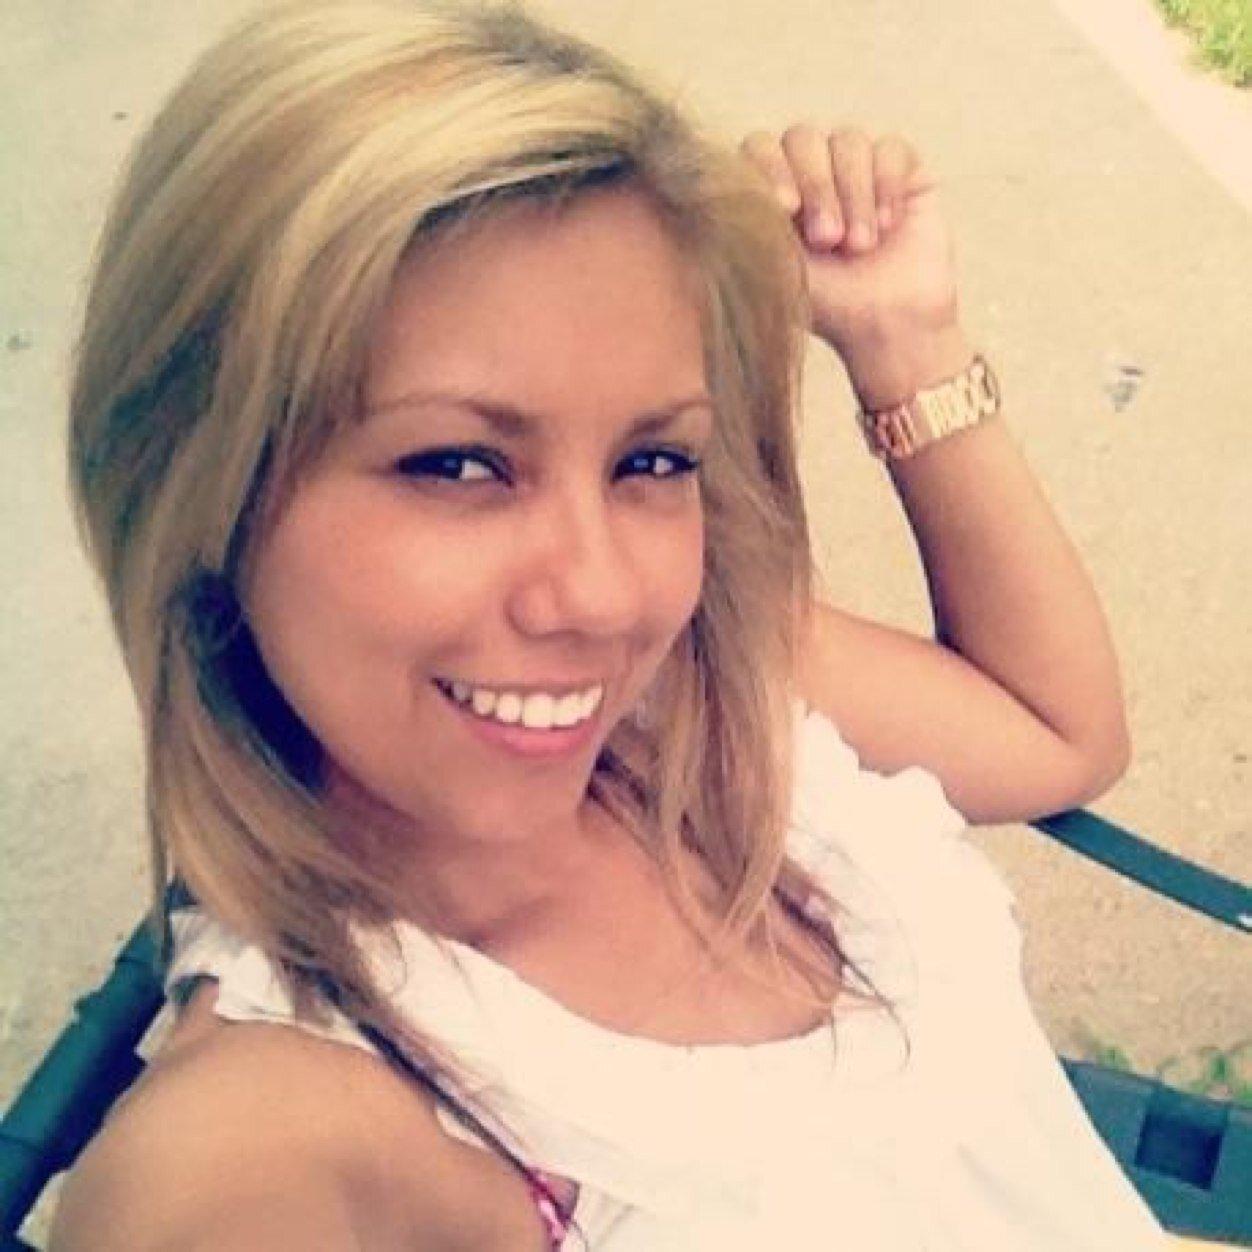 Twitter Dania Ramirez nudes (67 photo), Pussy, Sideboobs, Selfie, cleavage 2015